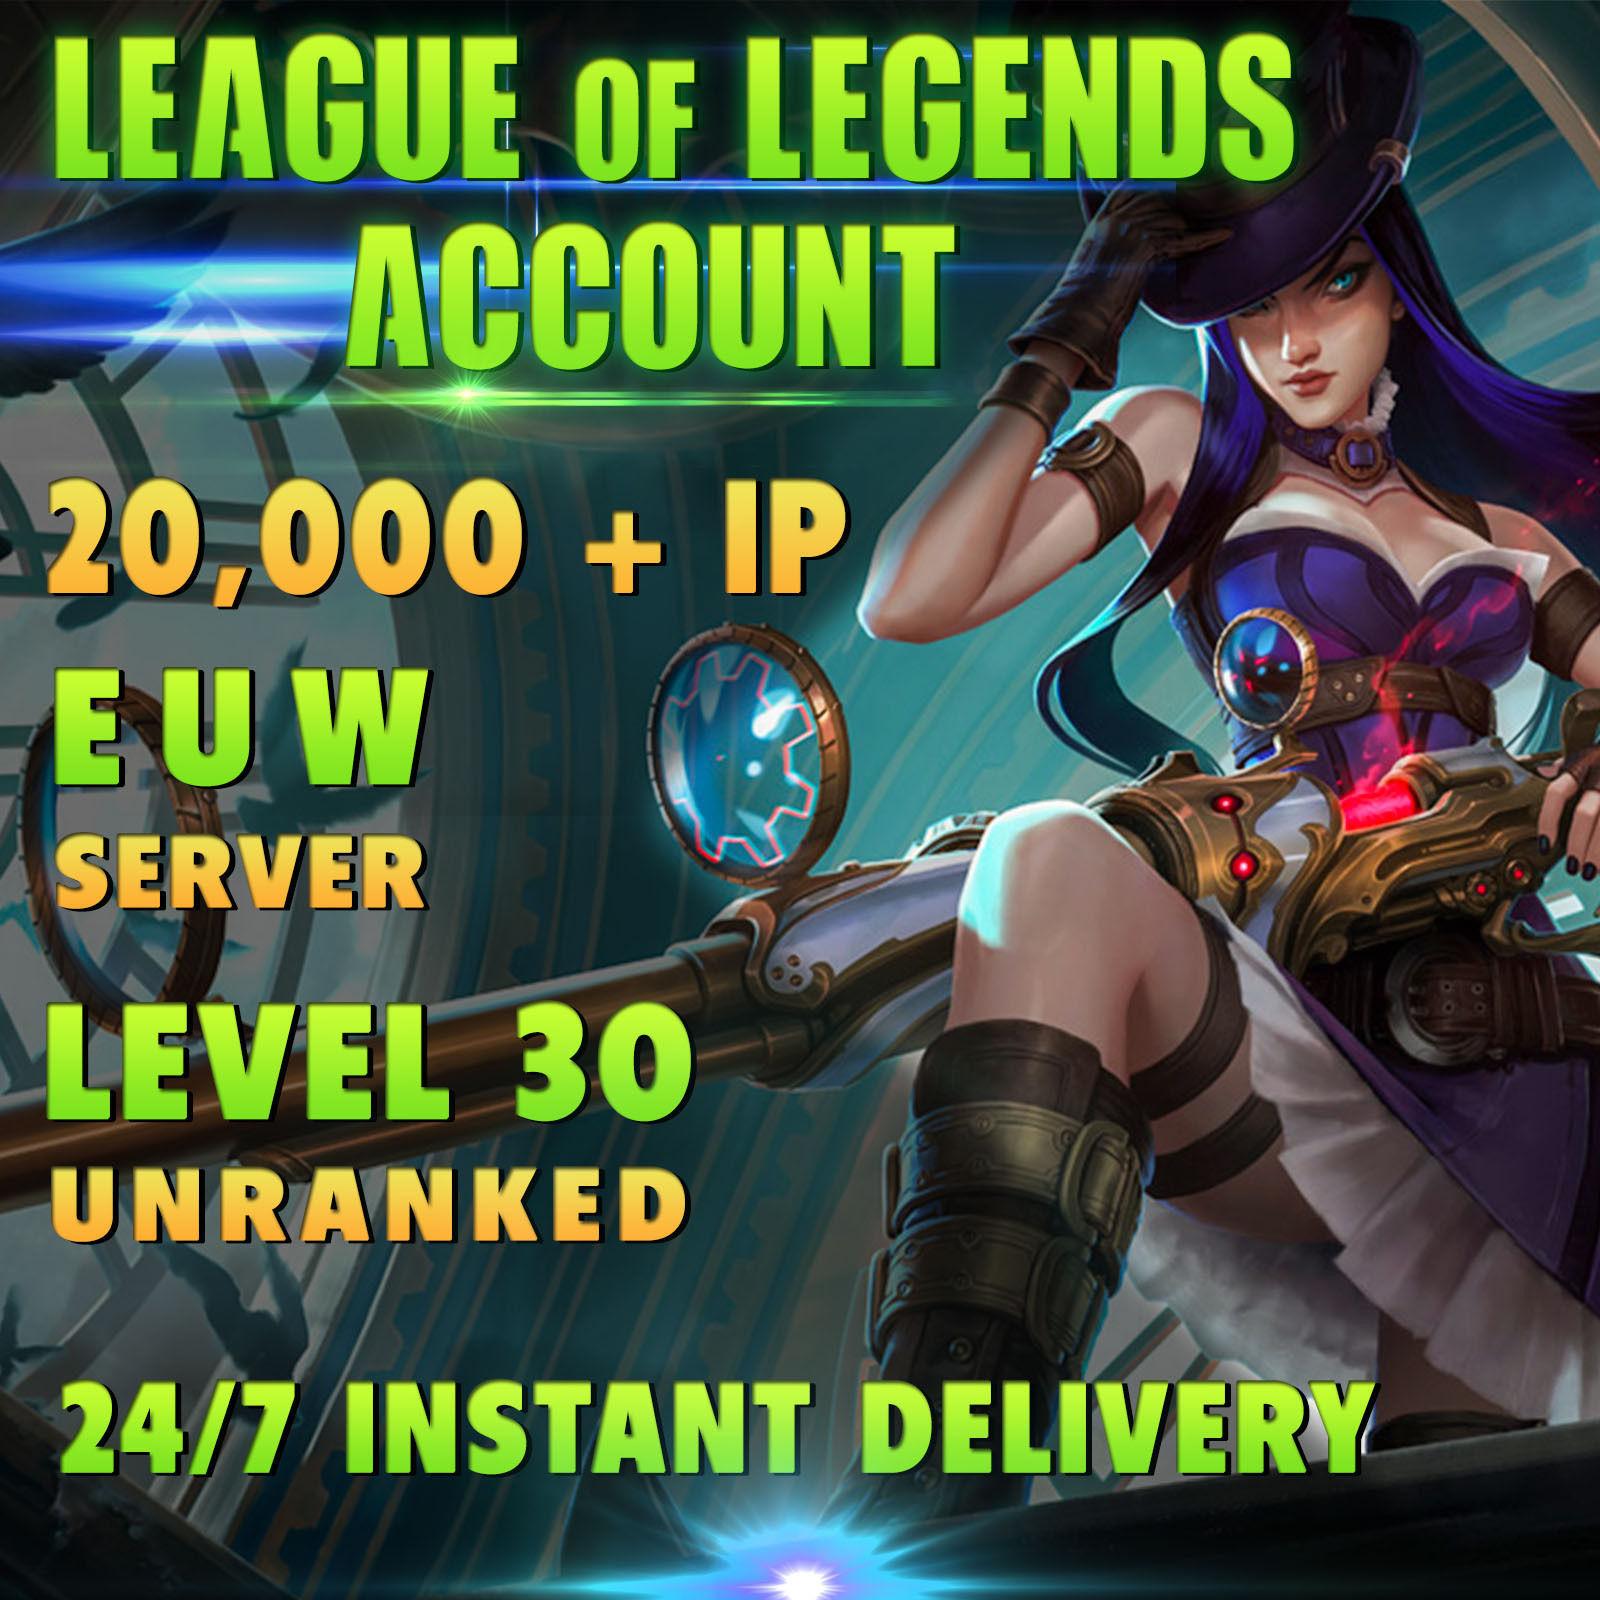 LOL Account League of Legends EUW Account level 30 ...